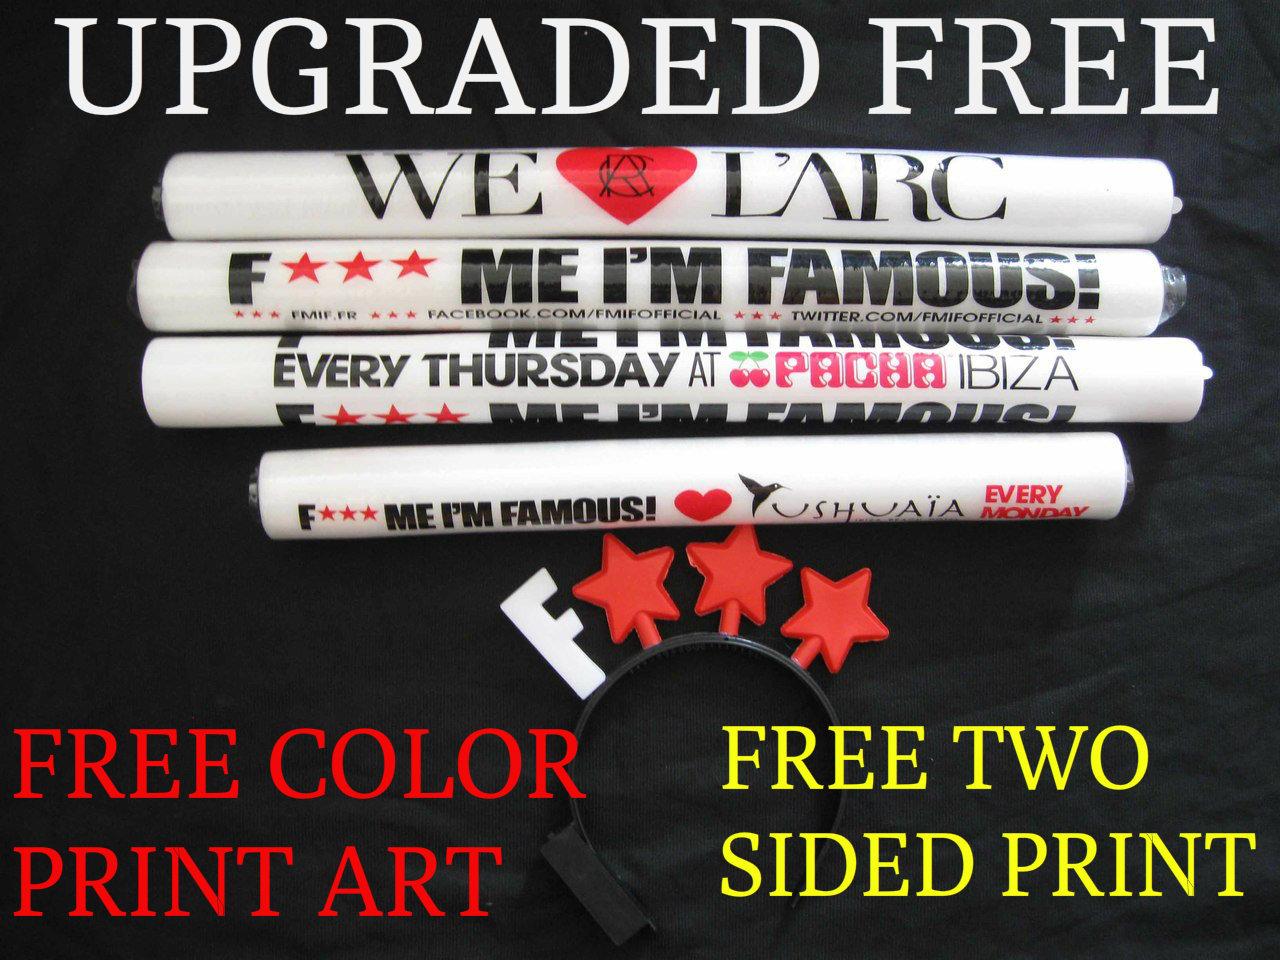 16-led-foam-stick-custom-glow-baton-lumiton-free-color-print-personalize-full-color-two-sided-fullcolor-76549.1508916762.1280.1280.jpg